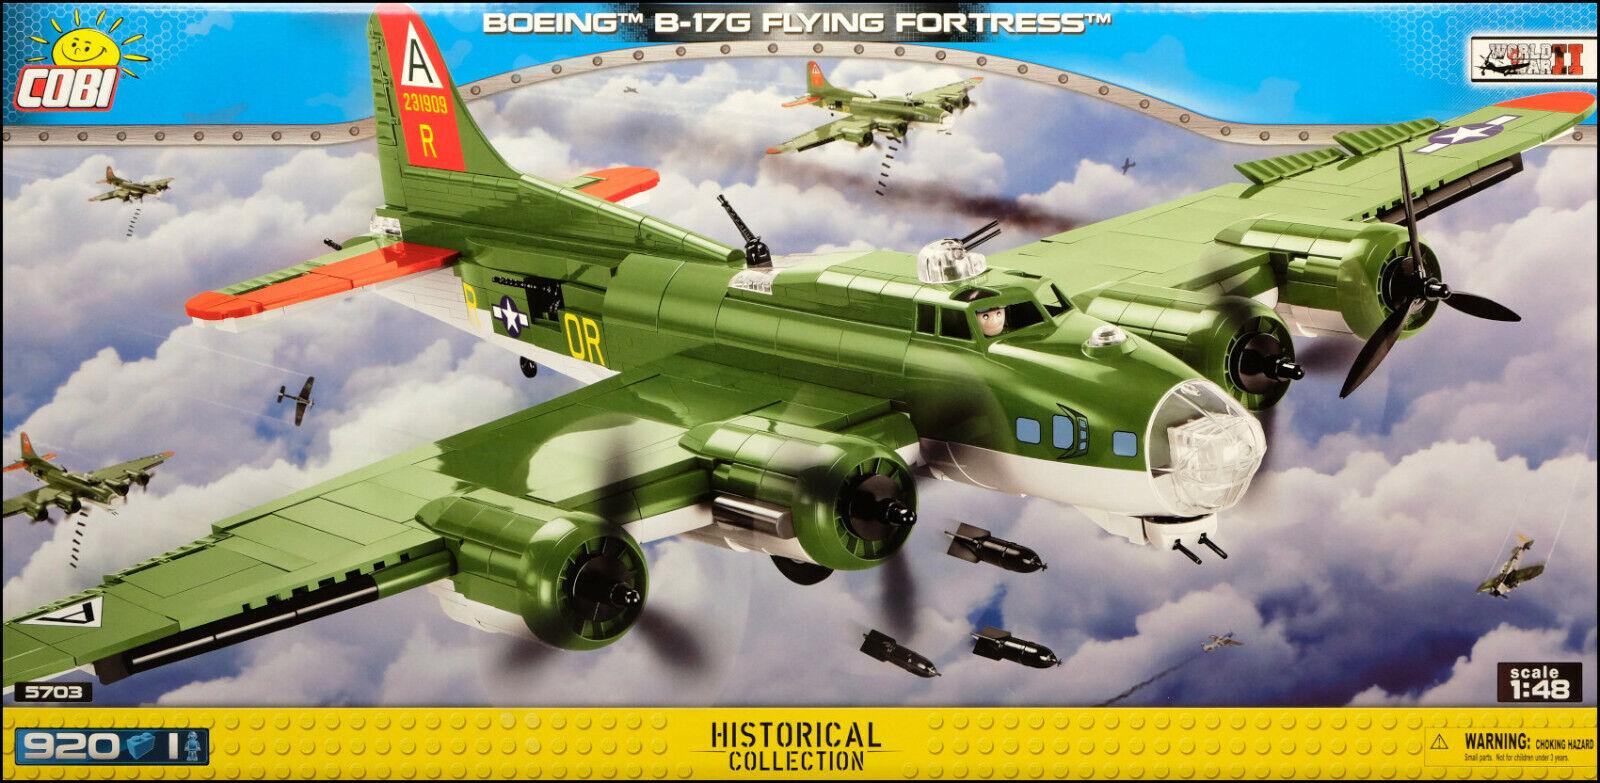 COBI B-17G Fliegening Fortress (5703) - 920 elem. - WW2 US heavy bomber